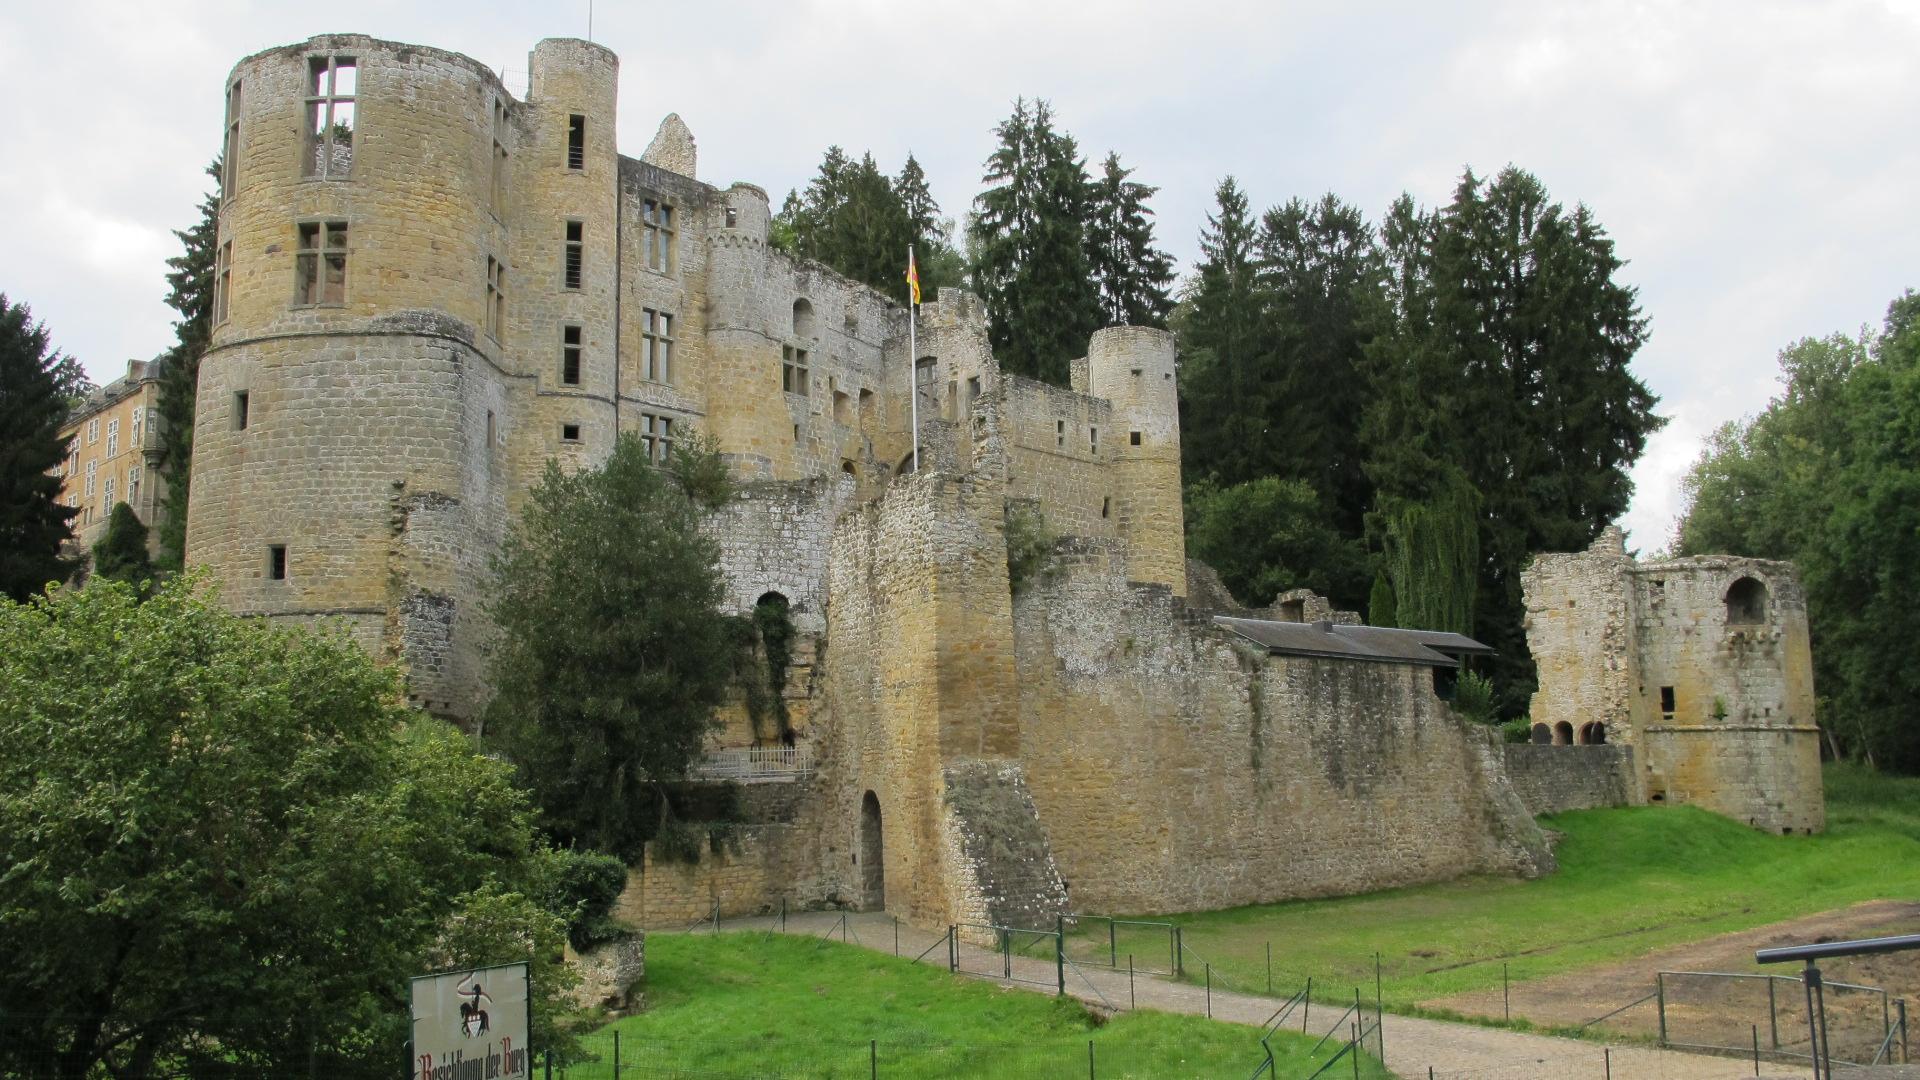 luxemburg-august-2014-080.jpg